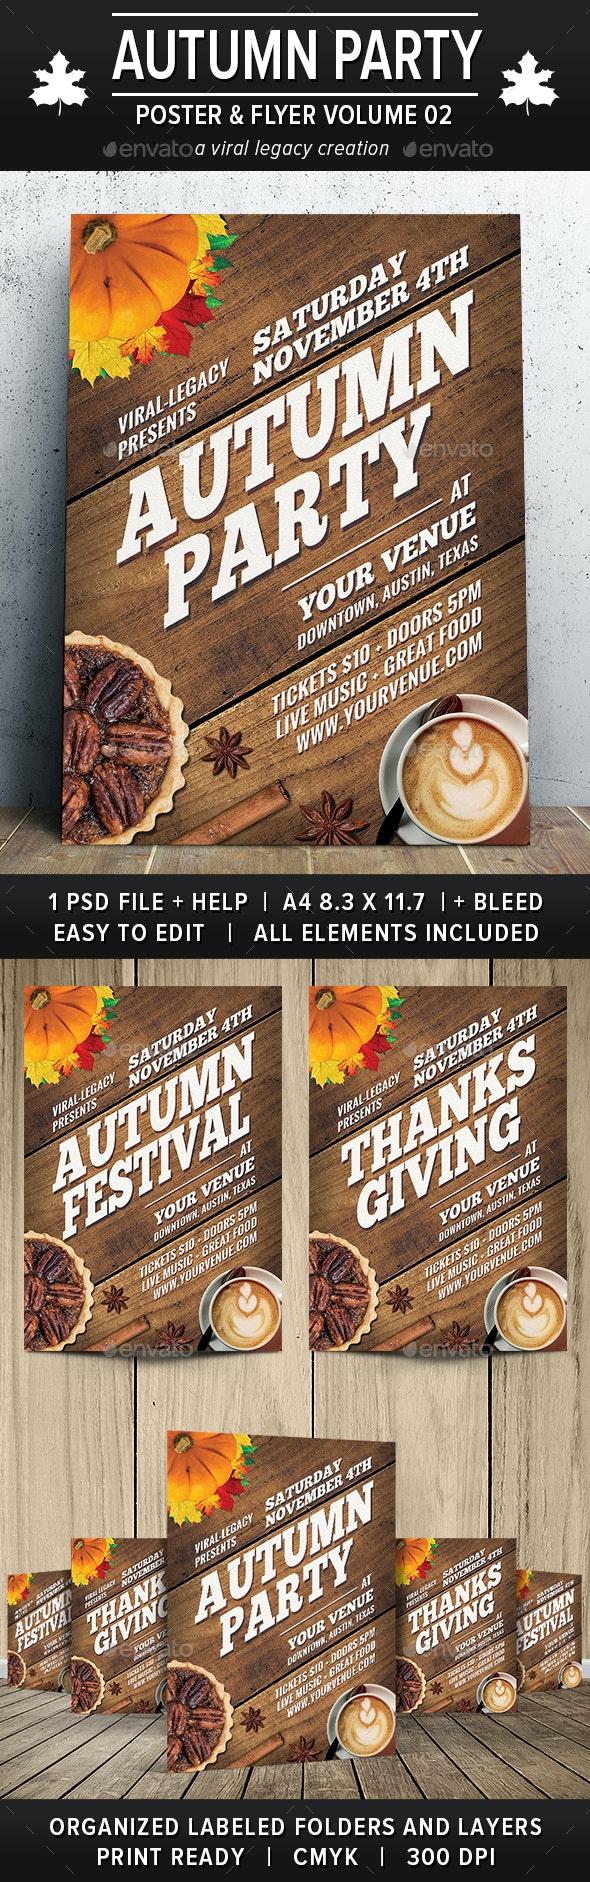 Autumn Party Poster / Flyer V02 - Flyers Print Templates